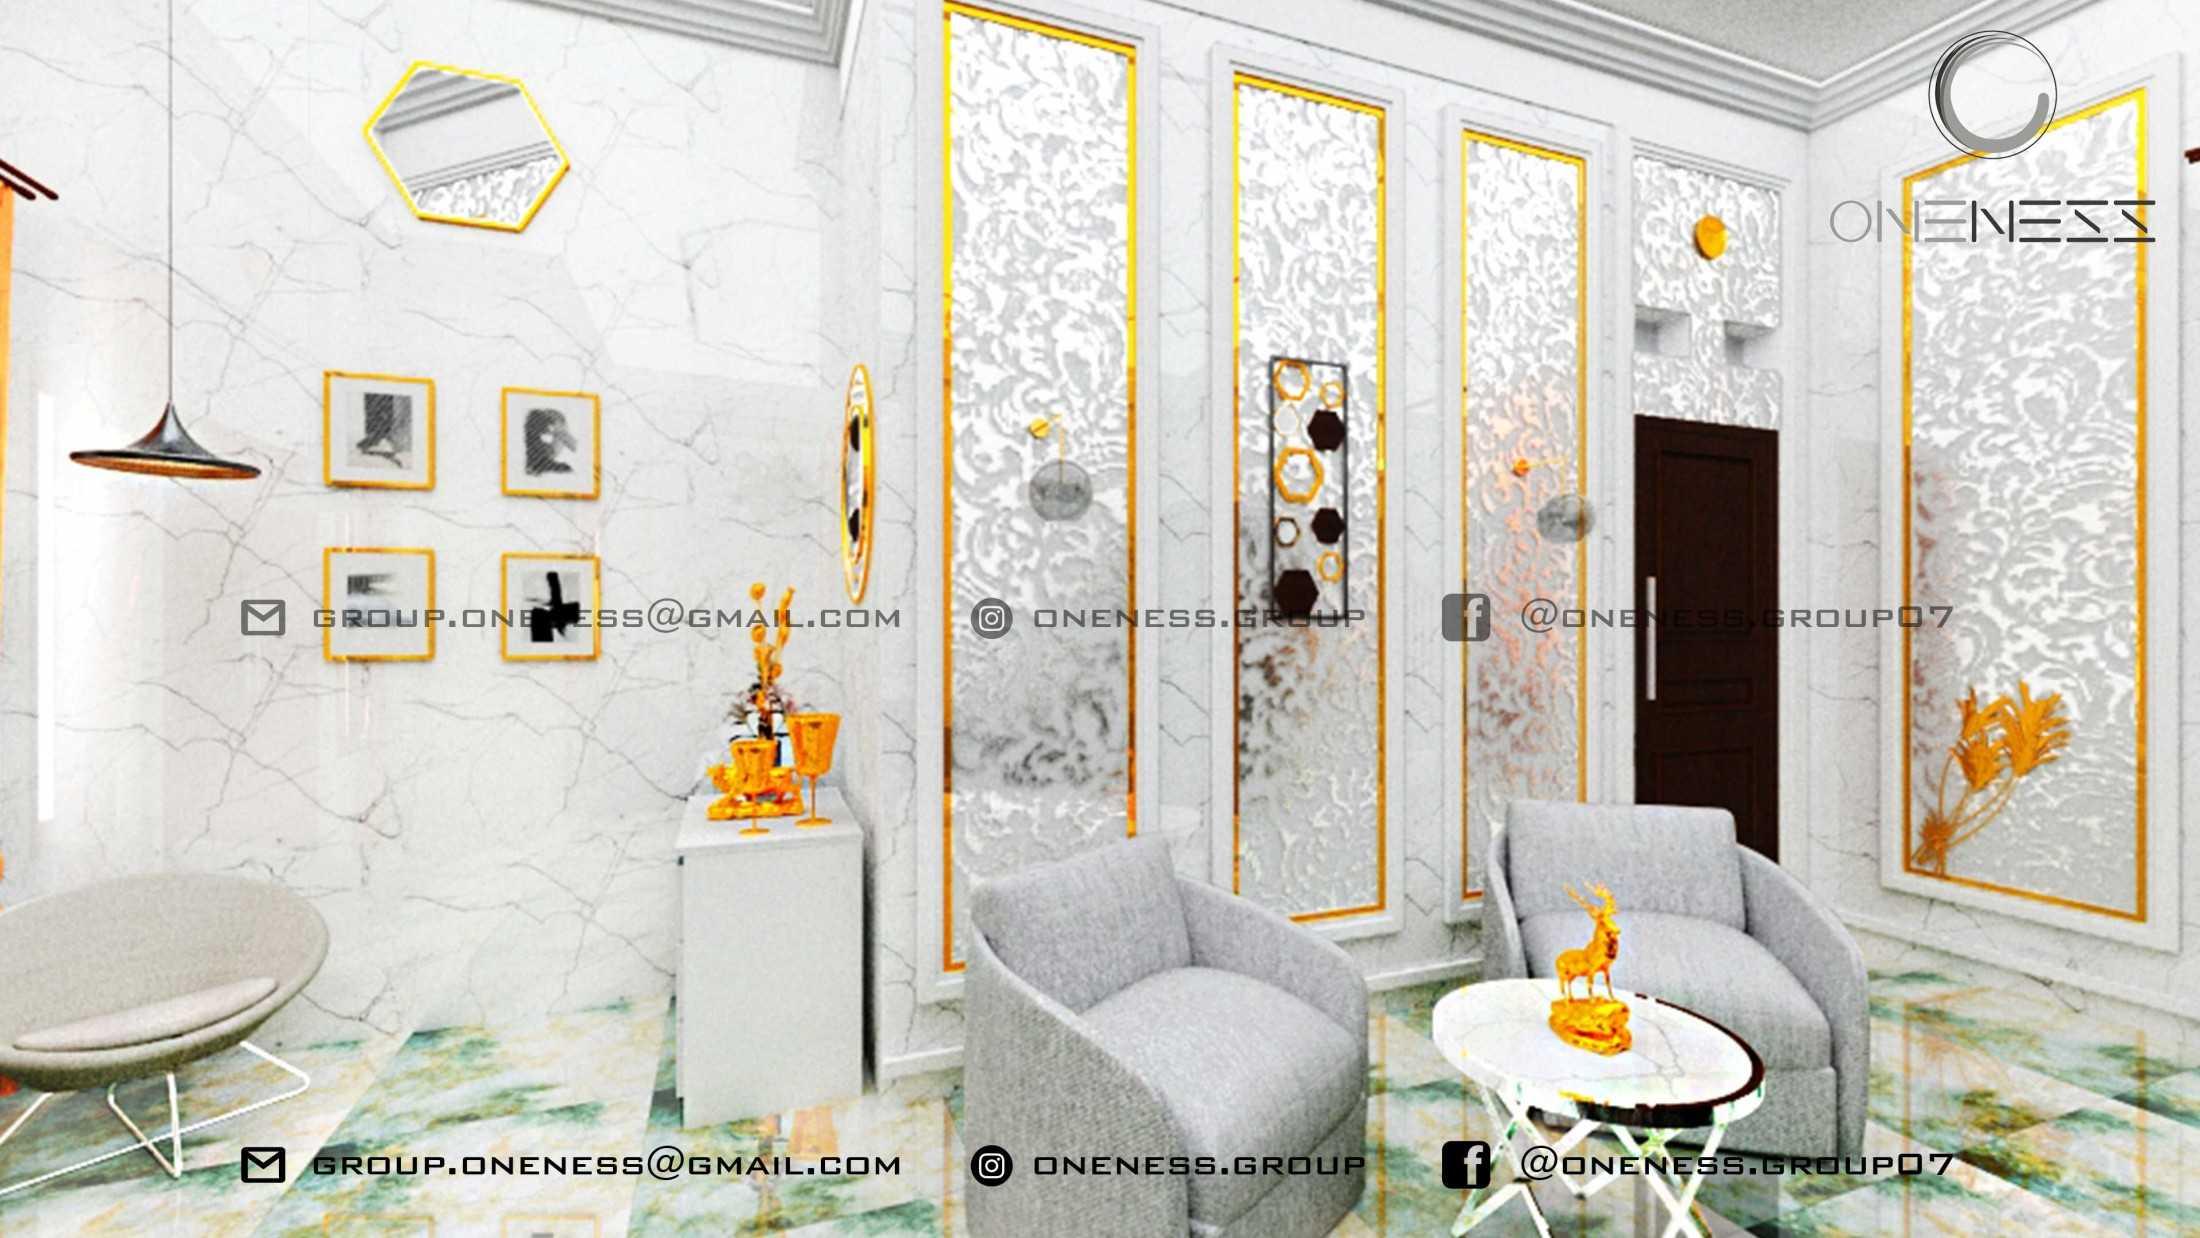 Oneness Group White Gold Classic Interior For Miss A Cirebon, Kota Cirebon, Jawa Barat, Indonesia Cirebon, Kota Cirebon, Jawa Barat, Indonesia Ruang Tamu Contemporary 98635